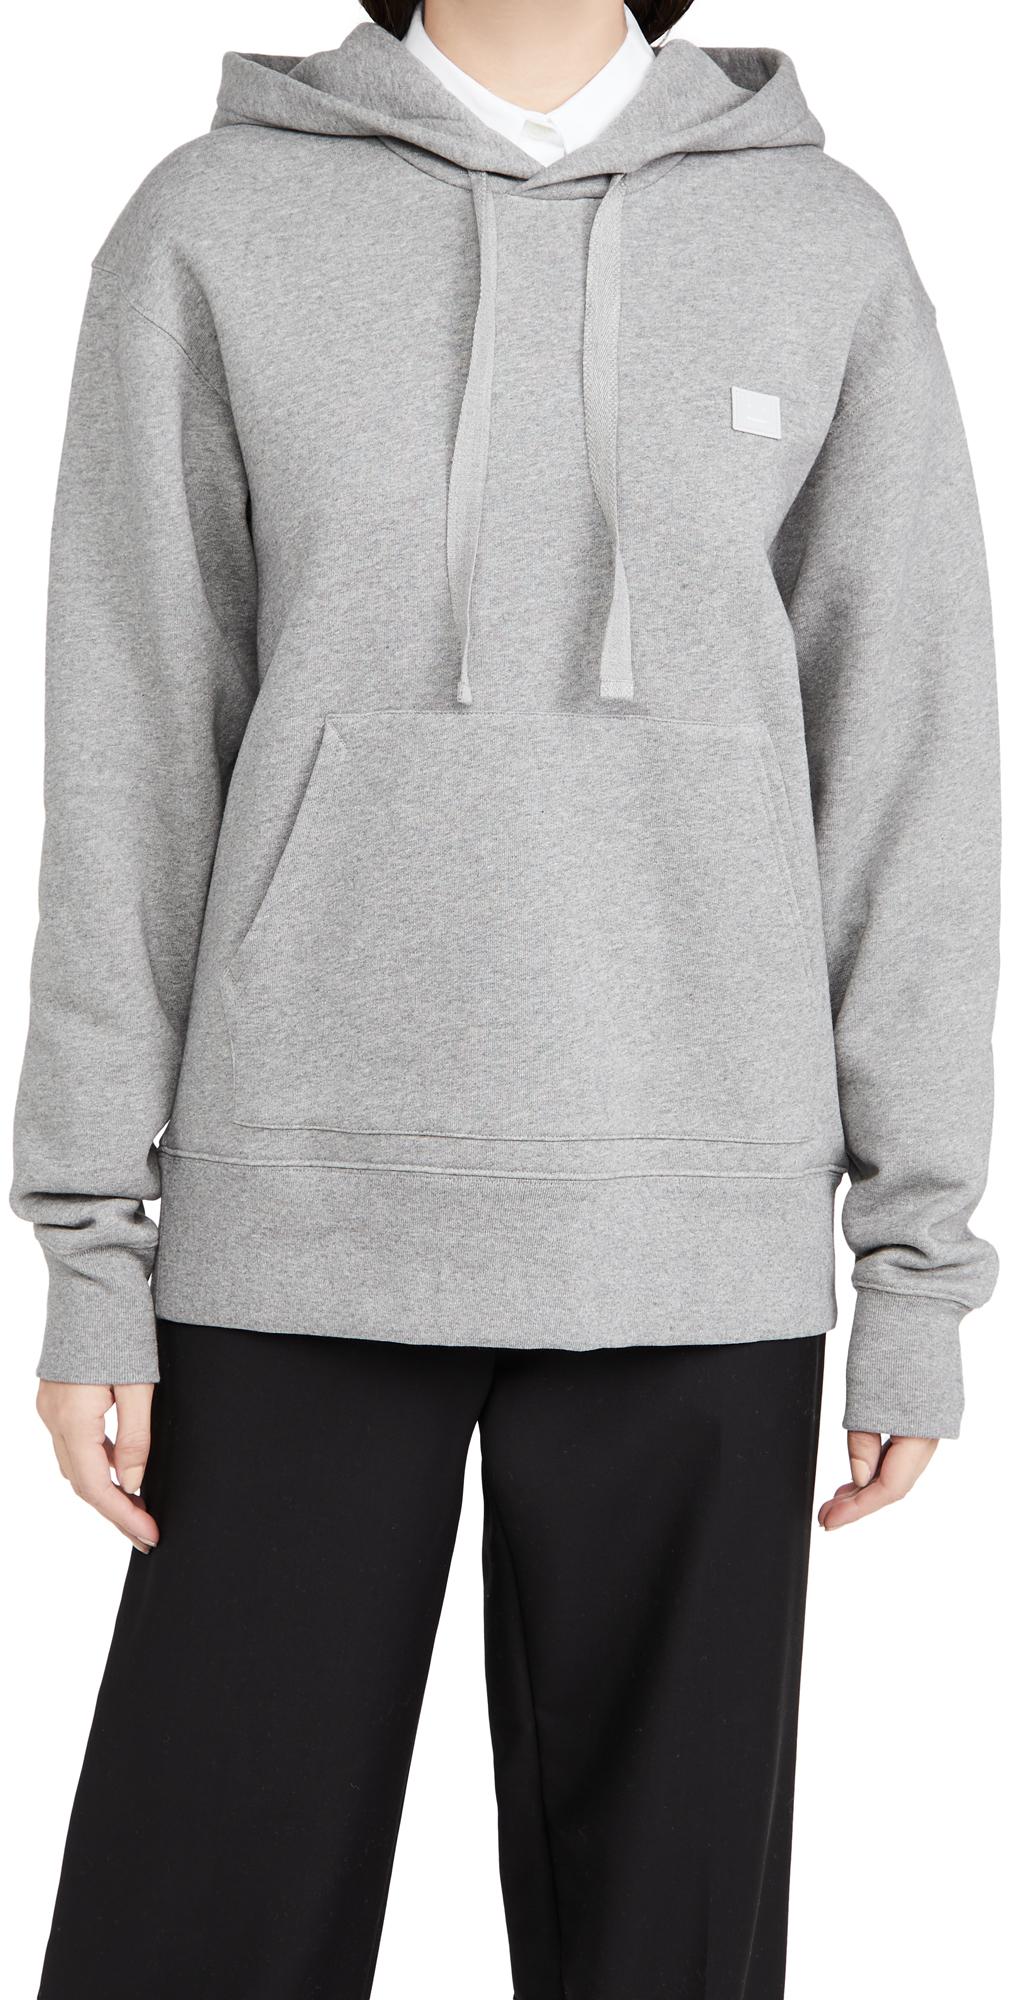 Acne Studios Hooded Sweatshirt